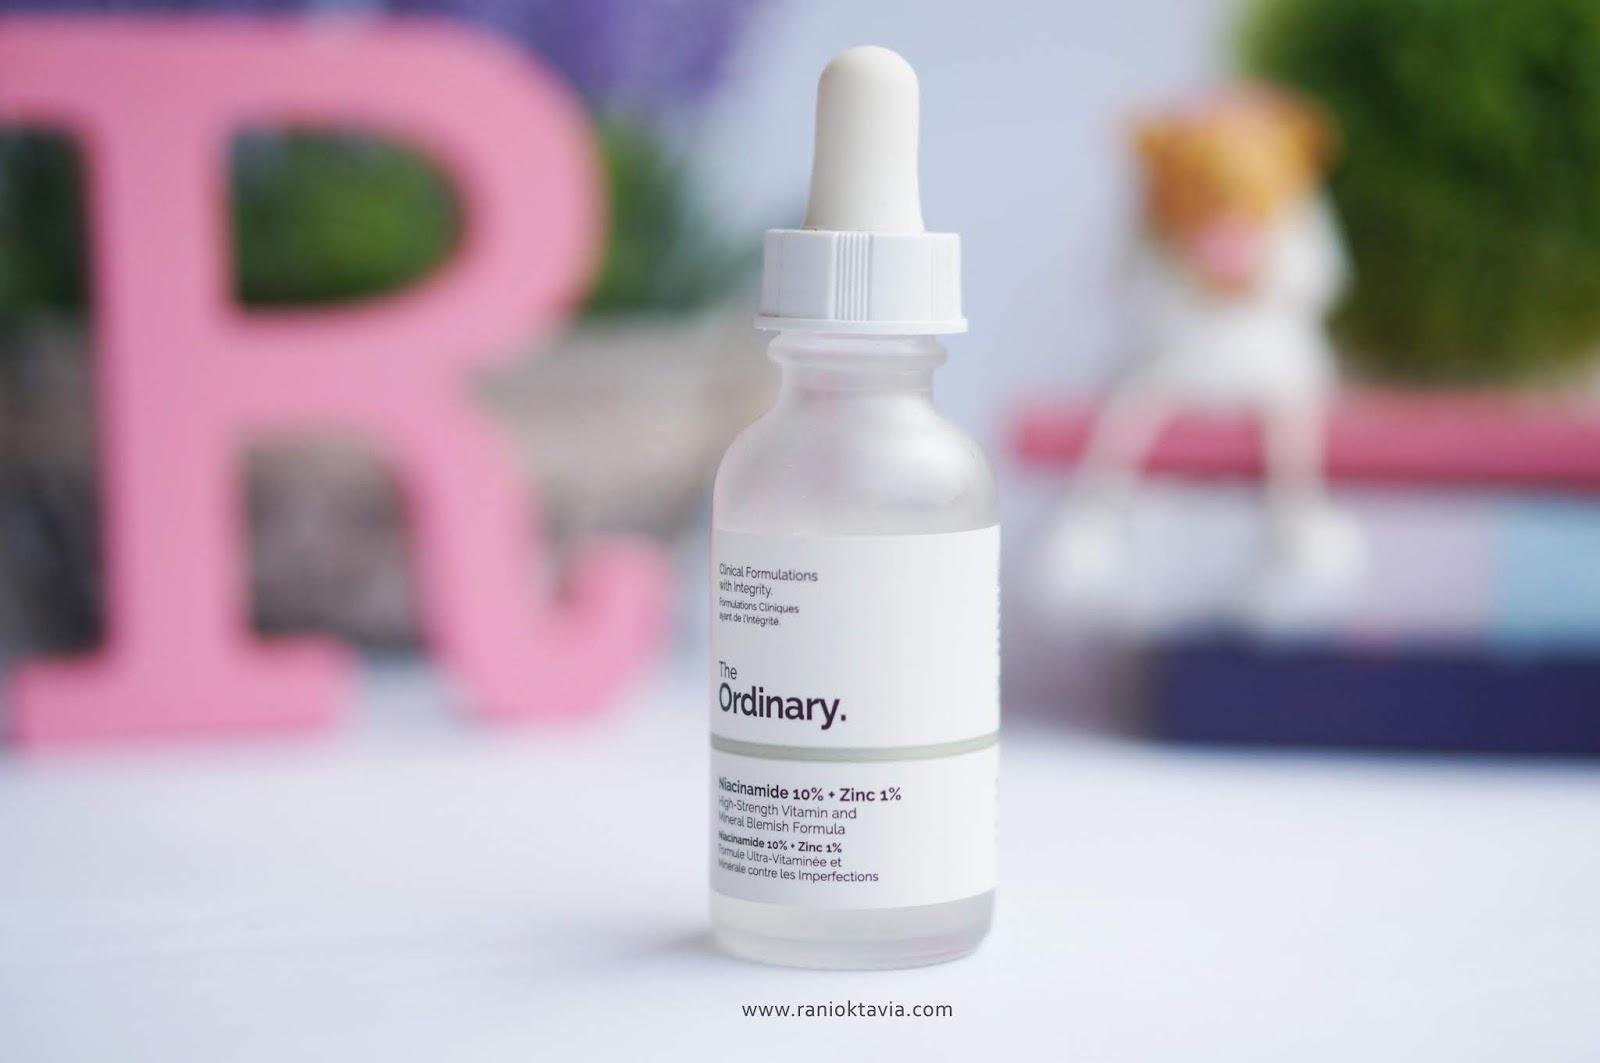 Skincare Review The Ordinary Untuk Kulit Kombinasi Dan Jerawat Beauty Blog By Rani Oktavia